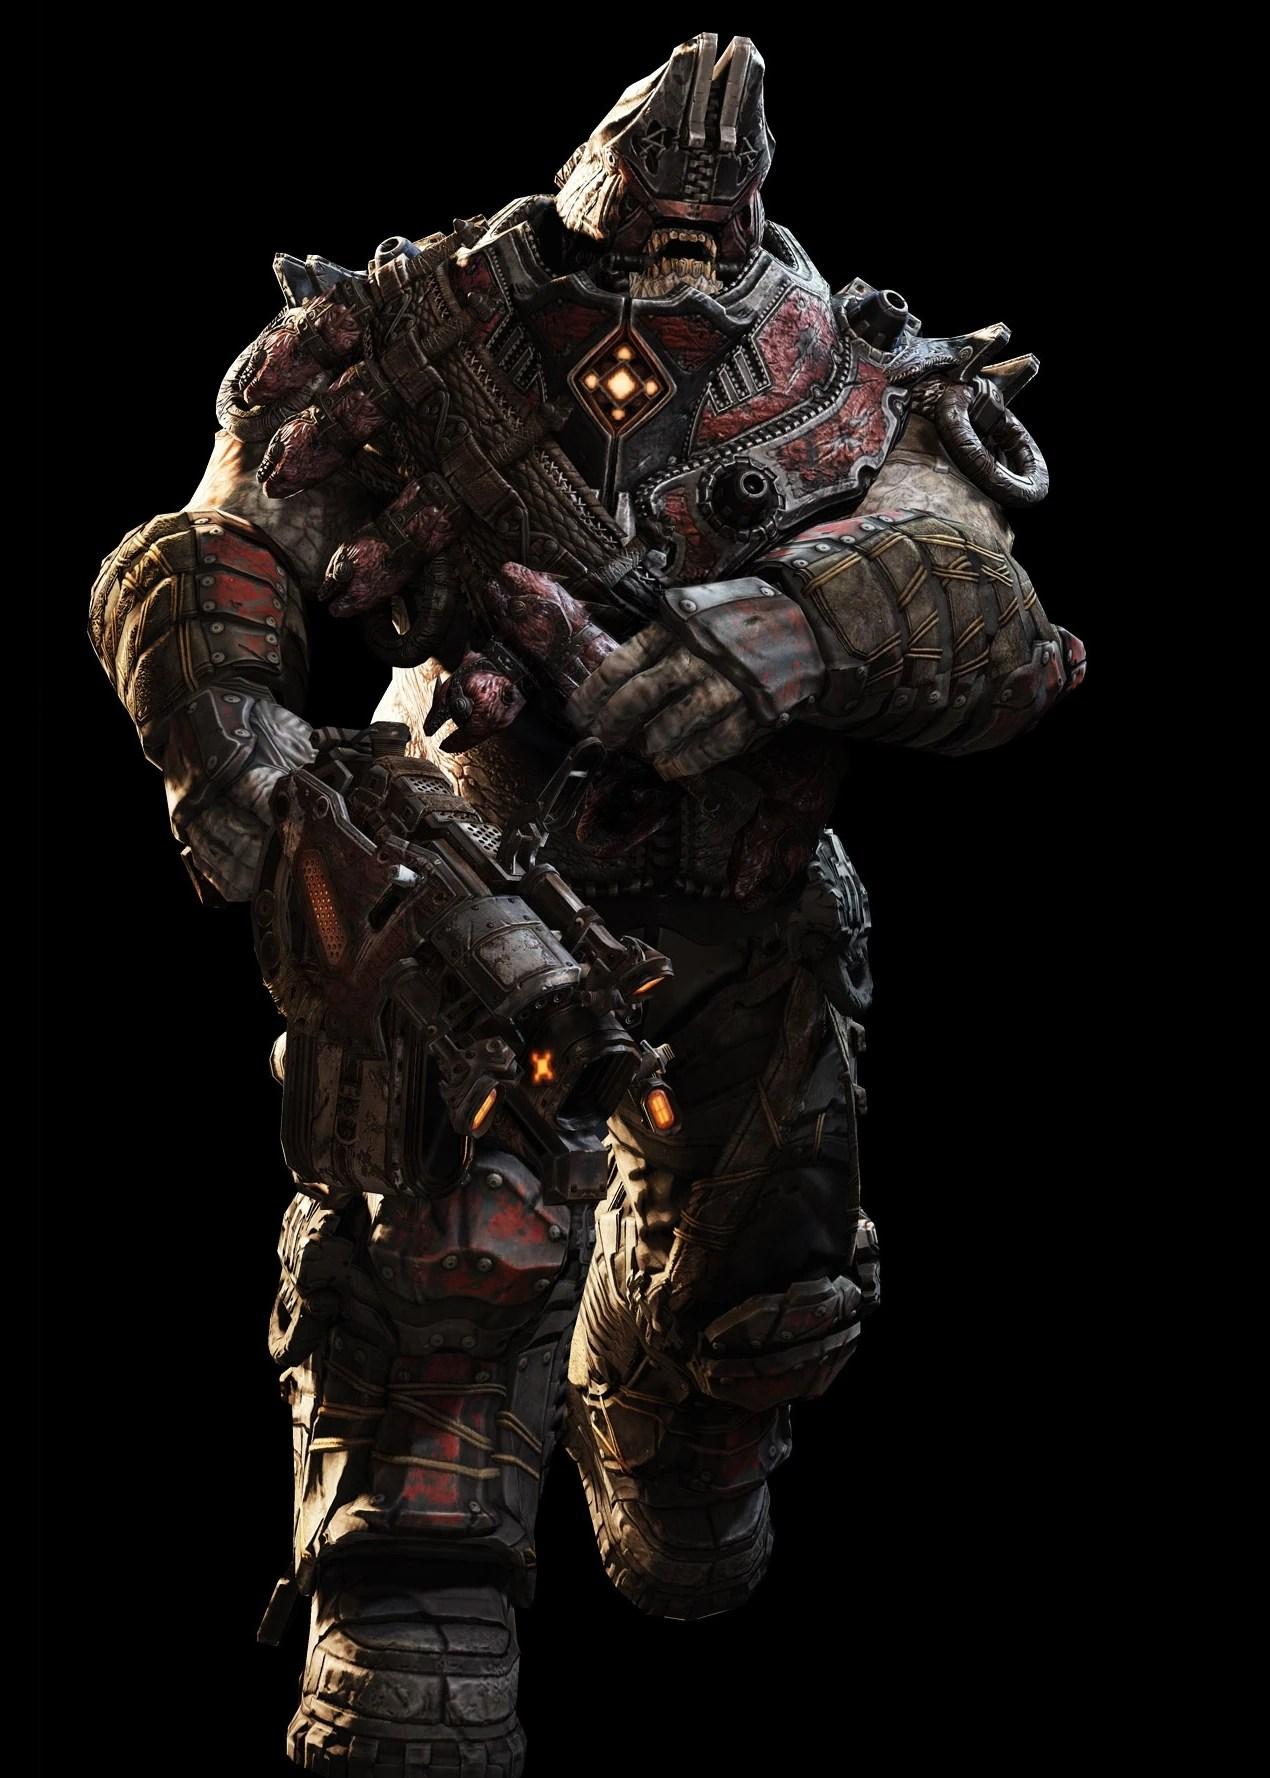 Killzone Shadow Fall Helghast Wallpaper Savage Boomer Gears Of War Fandom Powered By Wikia